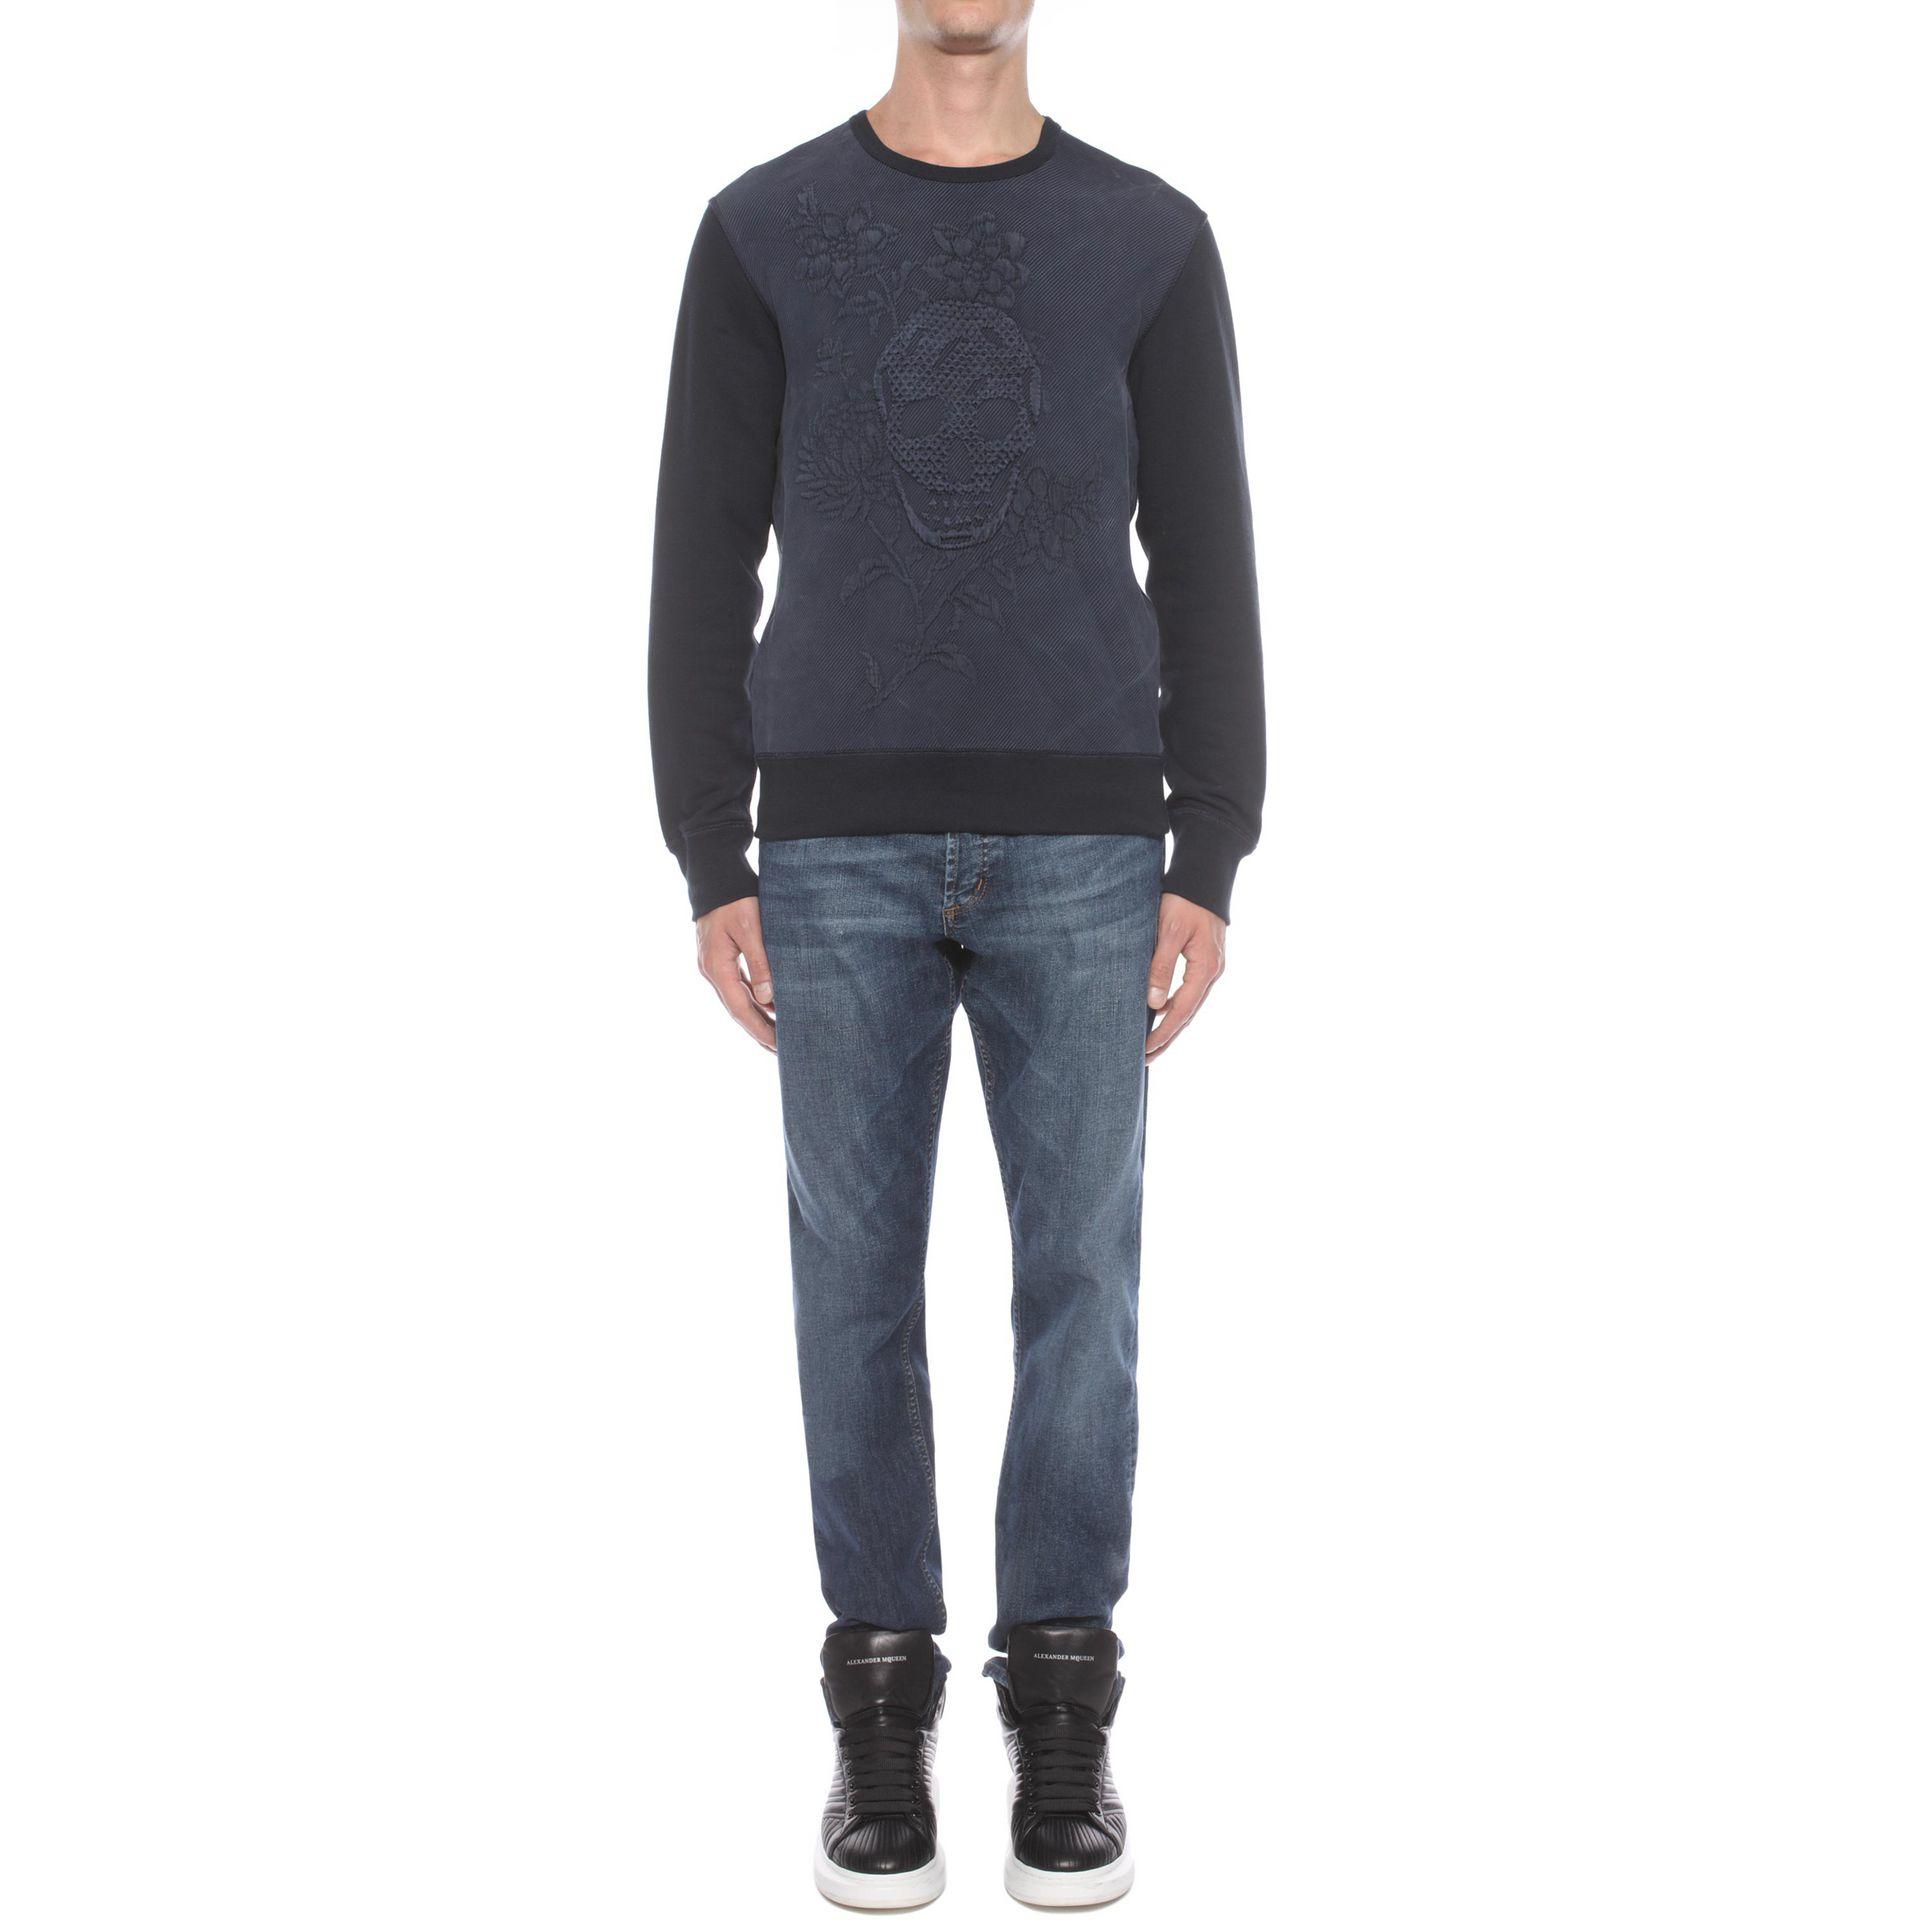 alexander mcqueen jacquard sweatshirt in blue for men navy lyst. Black Bedroom Furniture Sets. Home Design Ideas